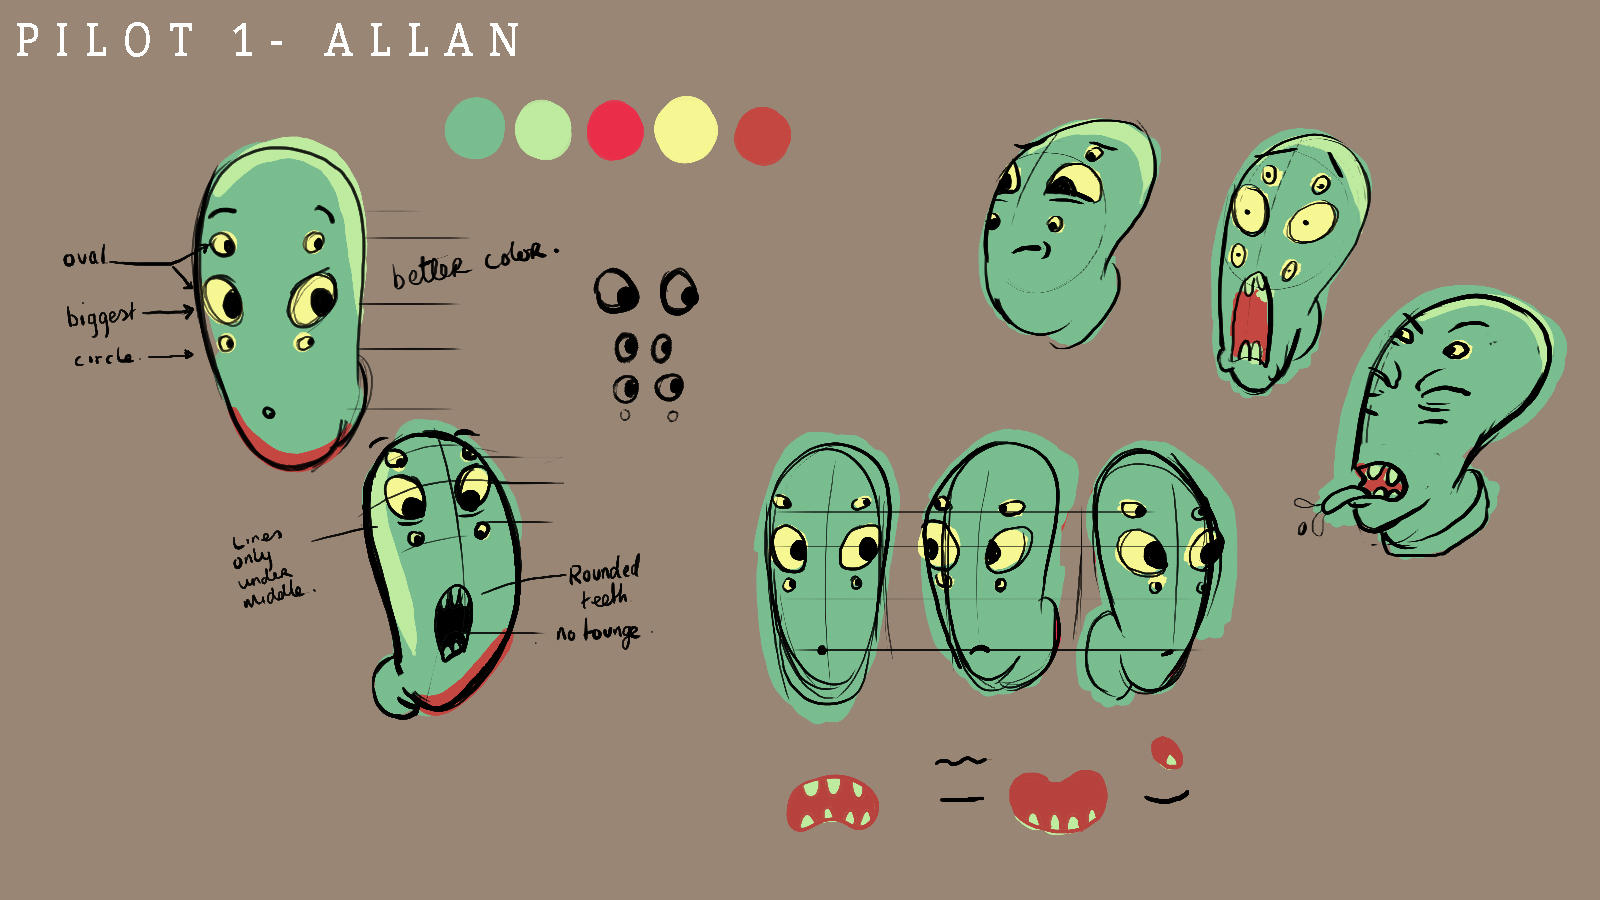 Allan_alien_turnaround.jpg